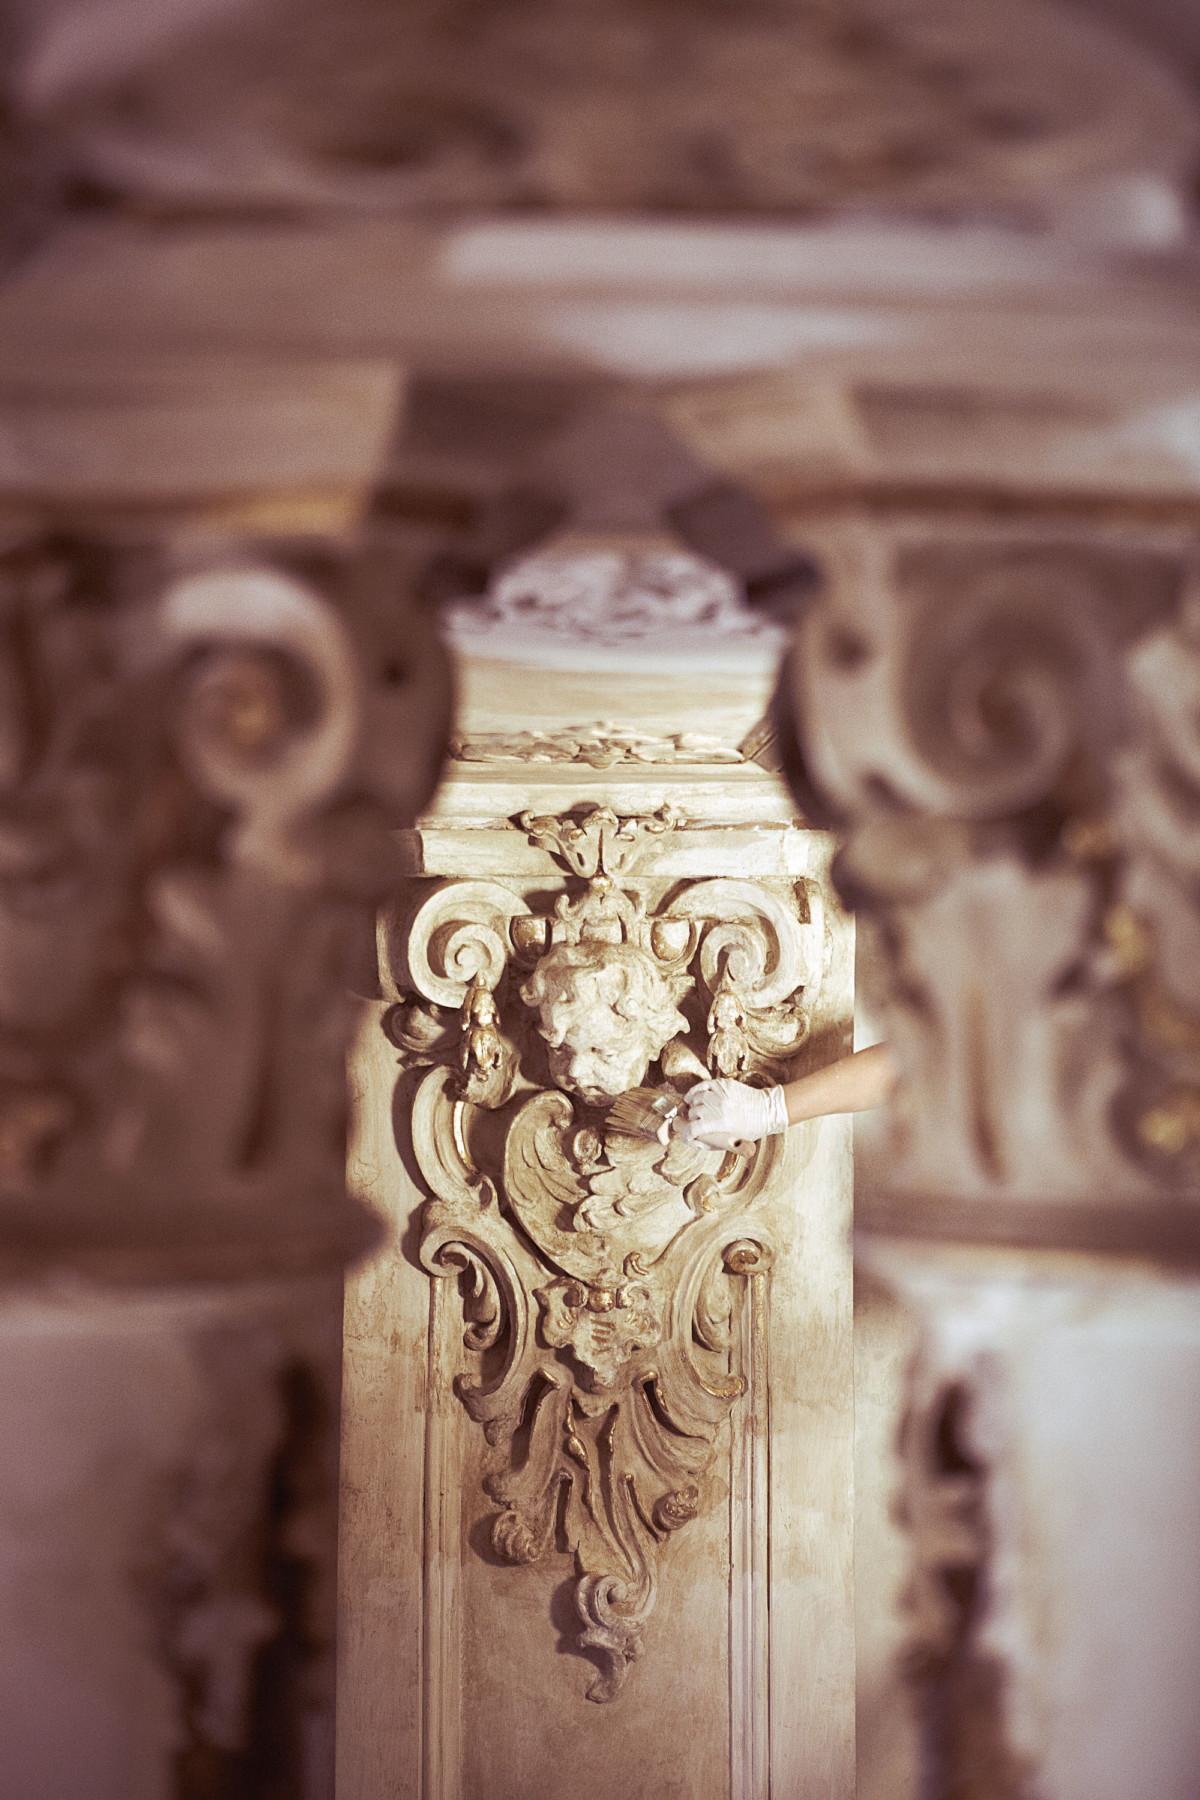 Jamie-Fobert-Architects Versace-Galleria-Vittorio-Emanuele-II-Milan-luxury-retail-heritage-restoration-2